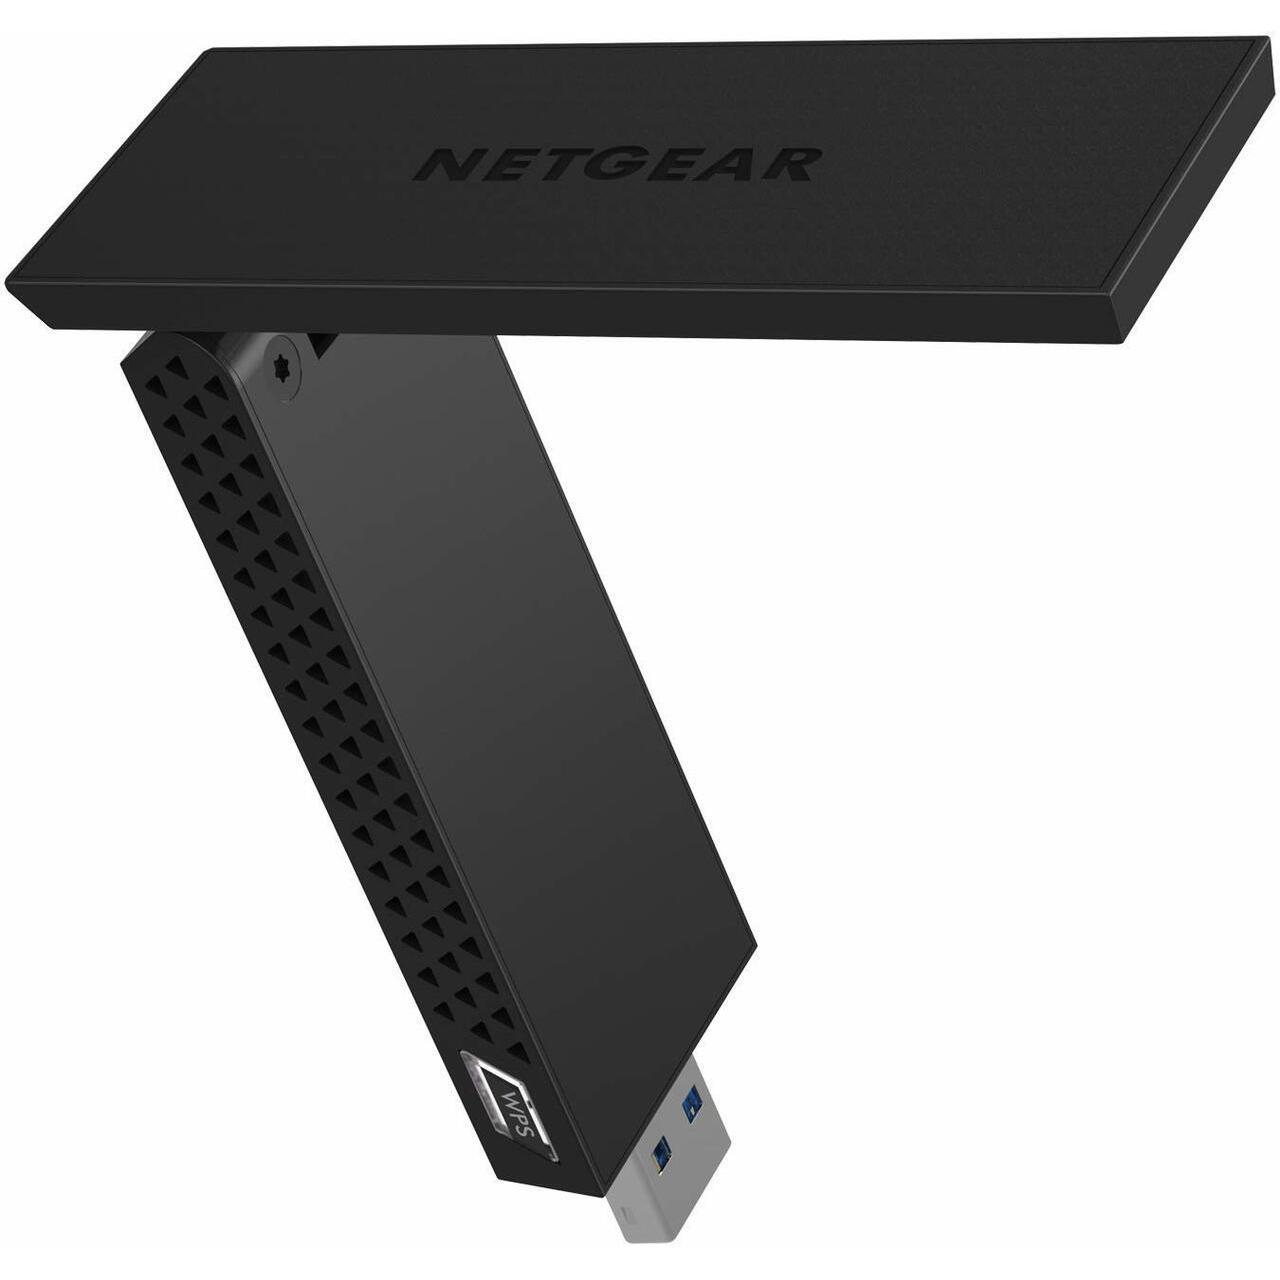 Adapter-USB Netgear A6210-10000R